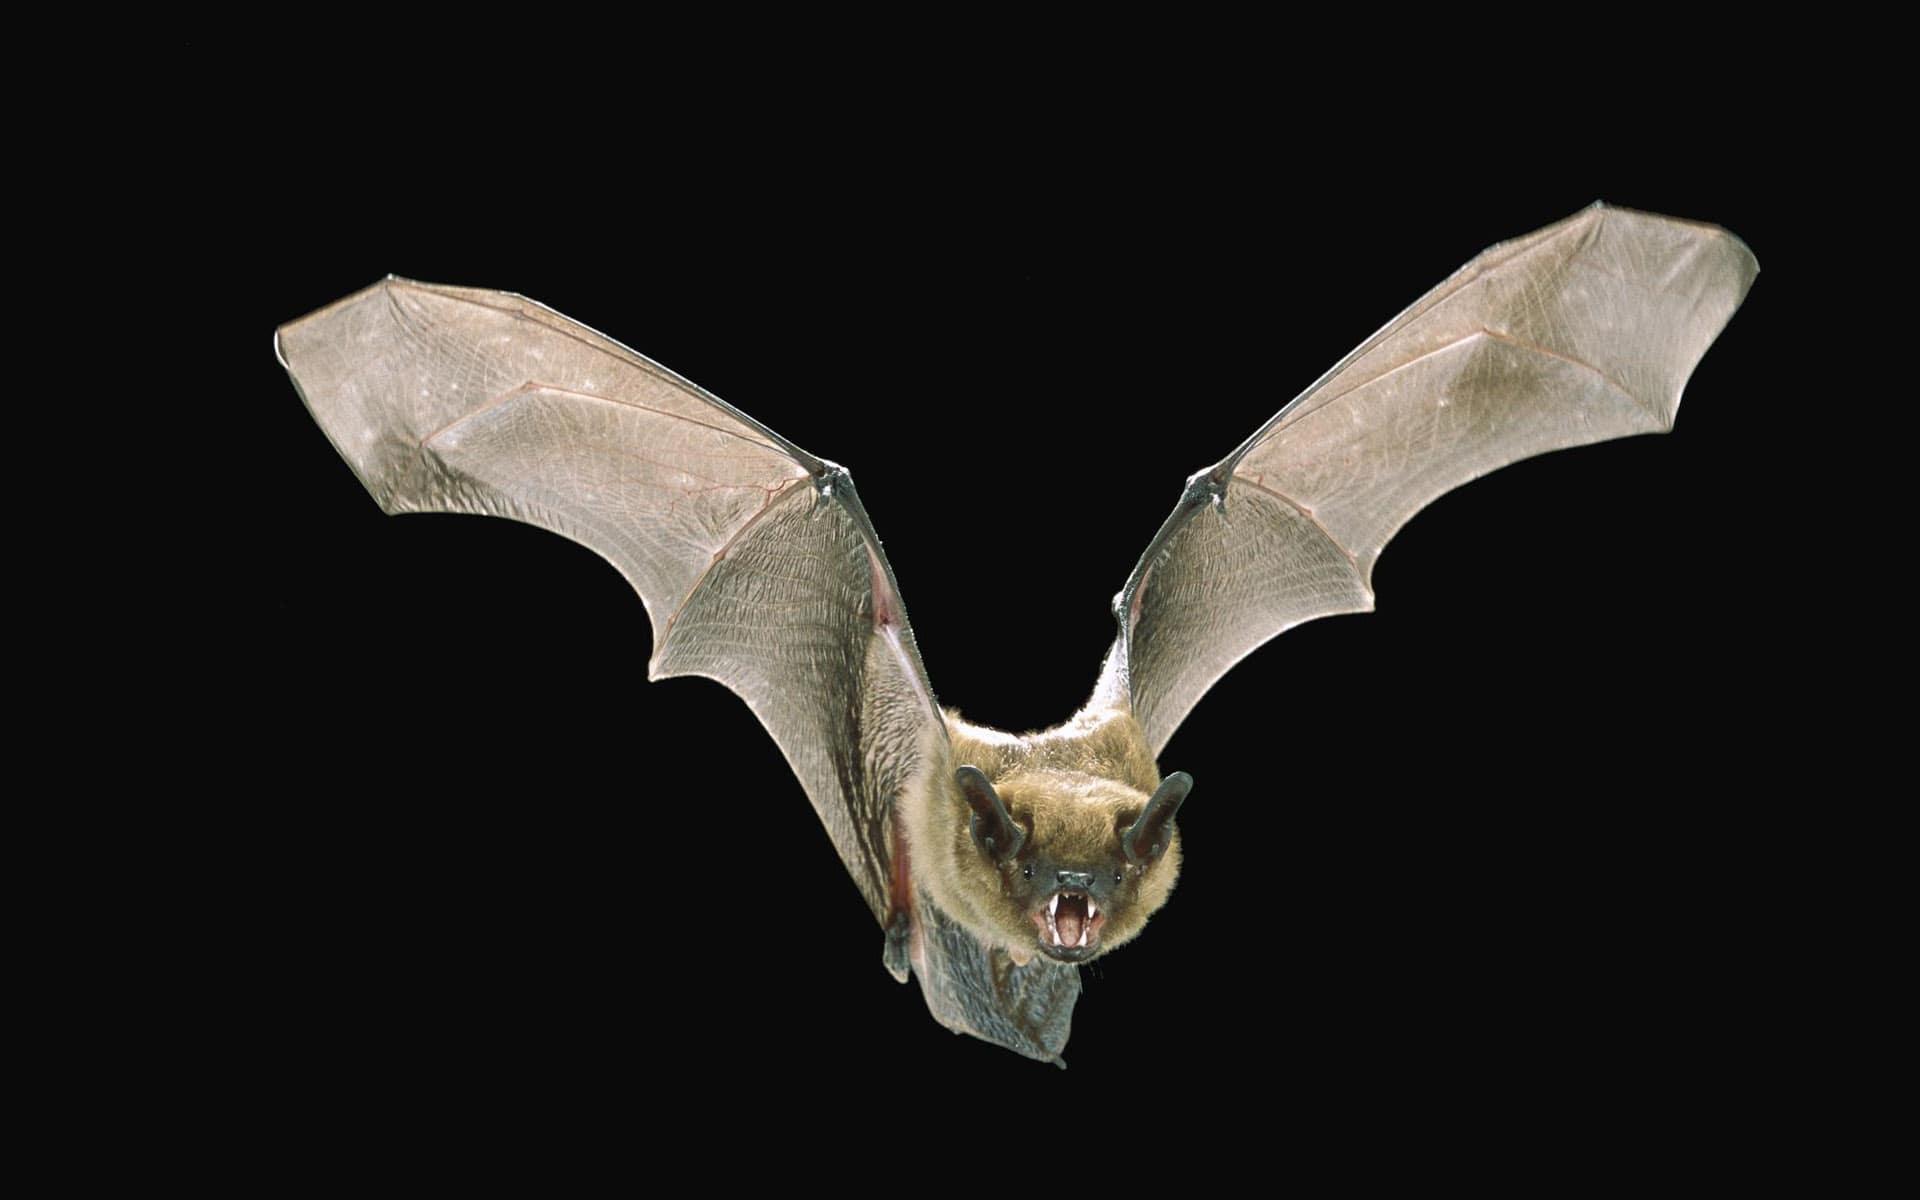 Bat full hd wallpapers